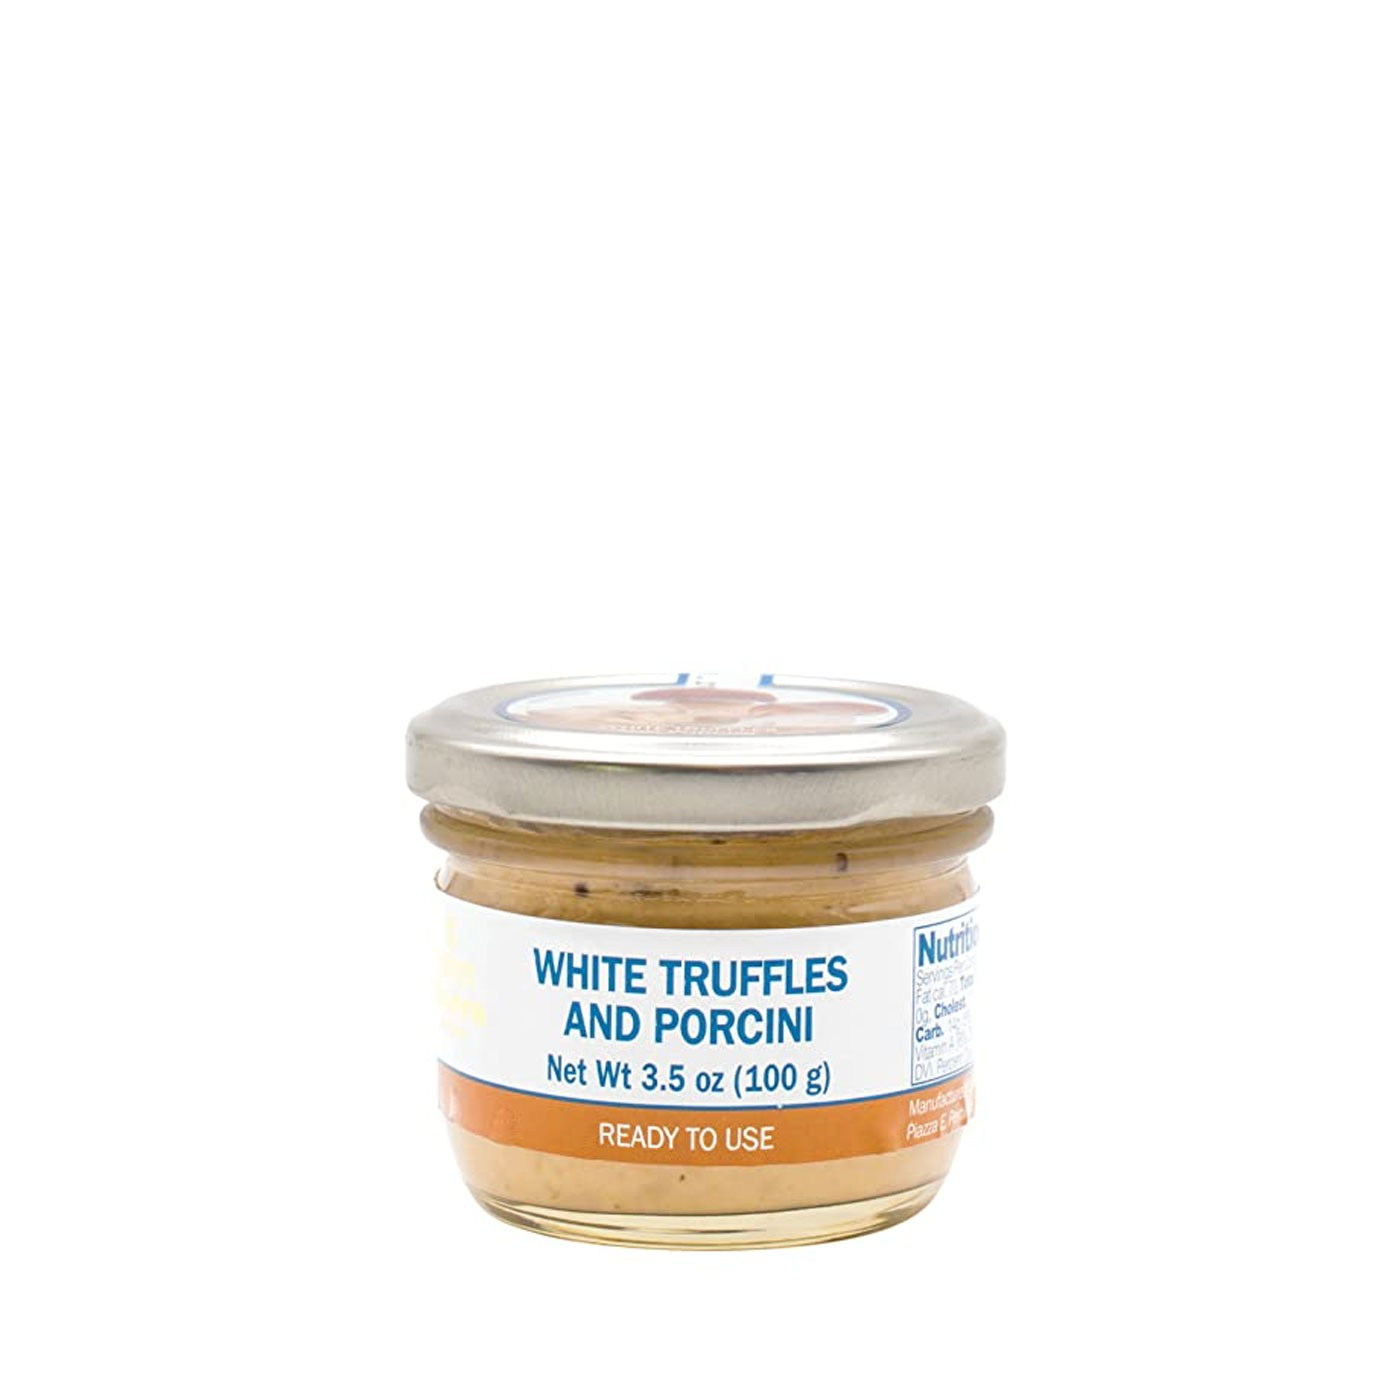 White Truffle and Porcini Mushroom Sauce 3.5 oz - La Morra | Eataly.com